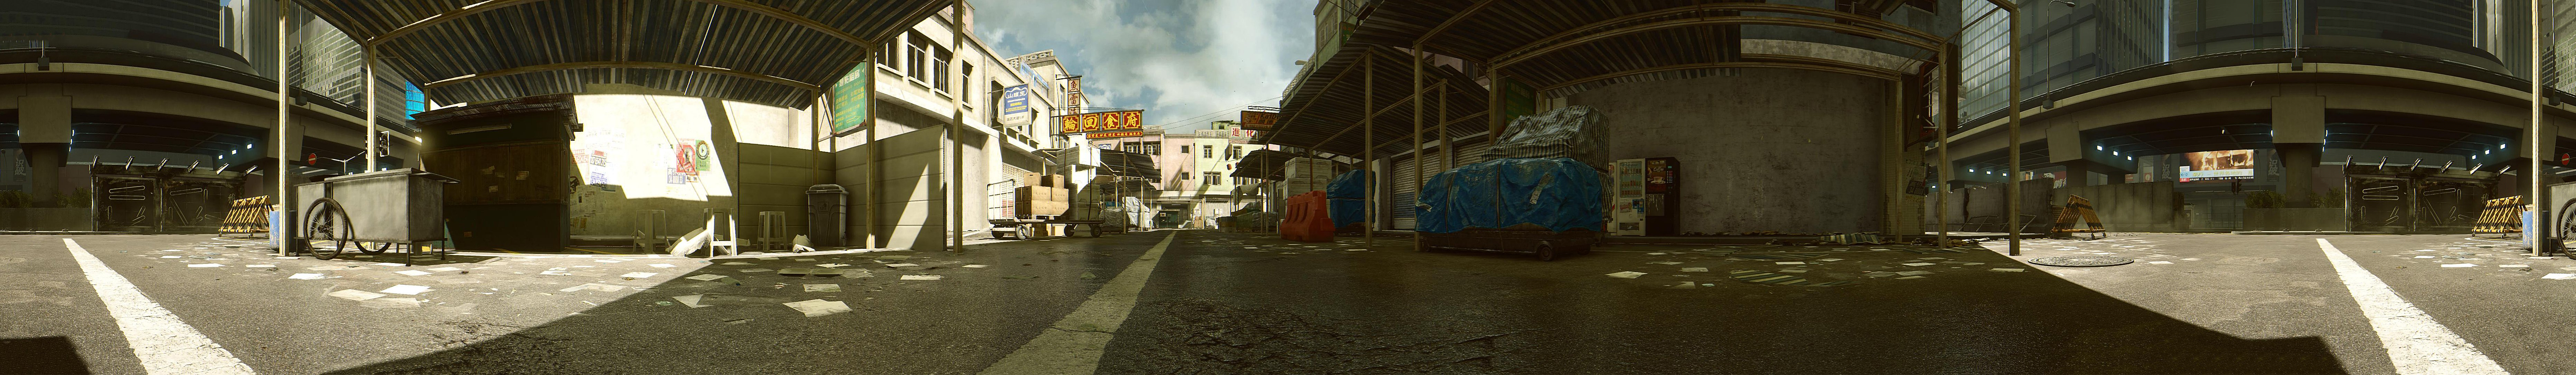 Battlefield 4 Dragon's Teeth в широком формате (панорама). - Изображение 2